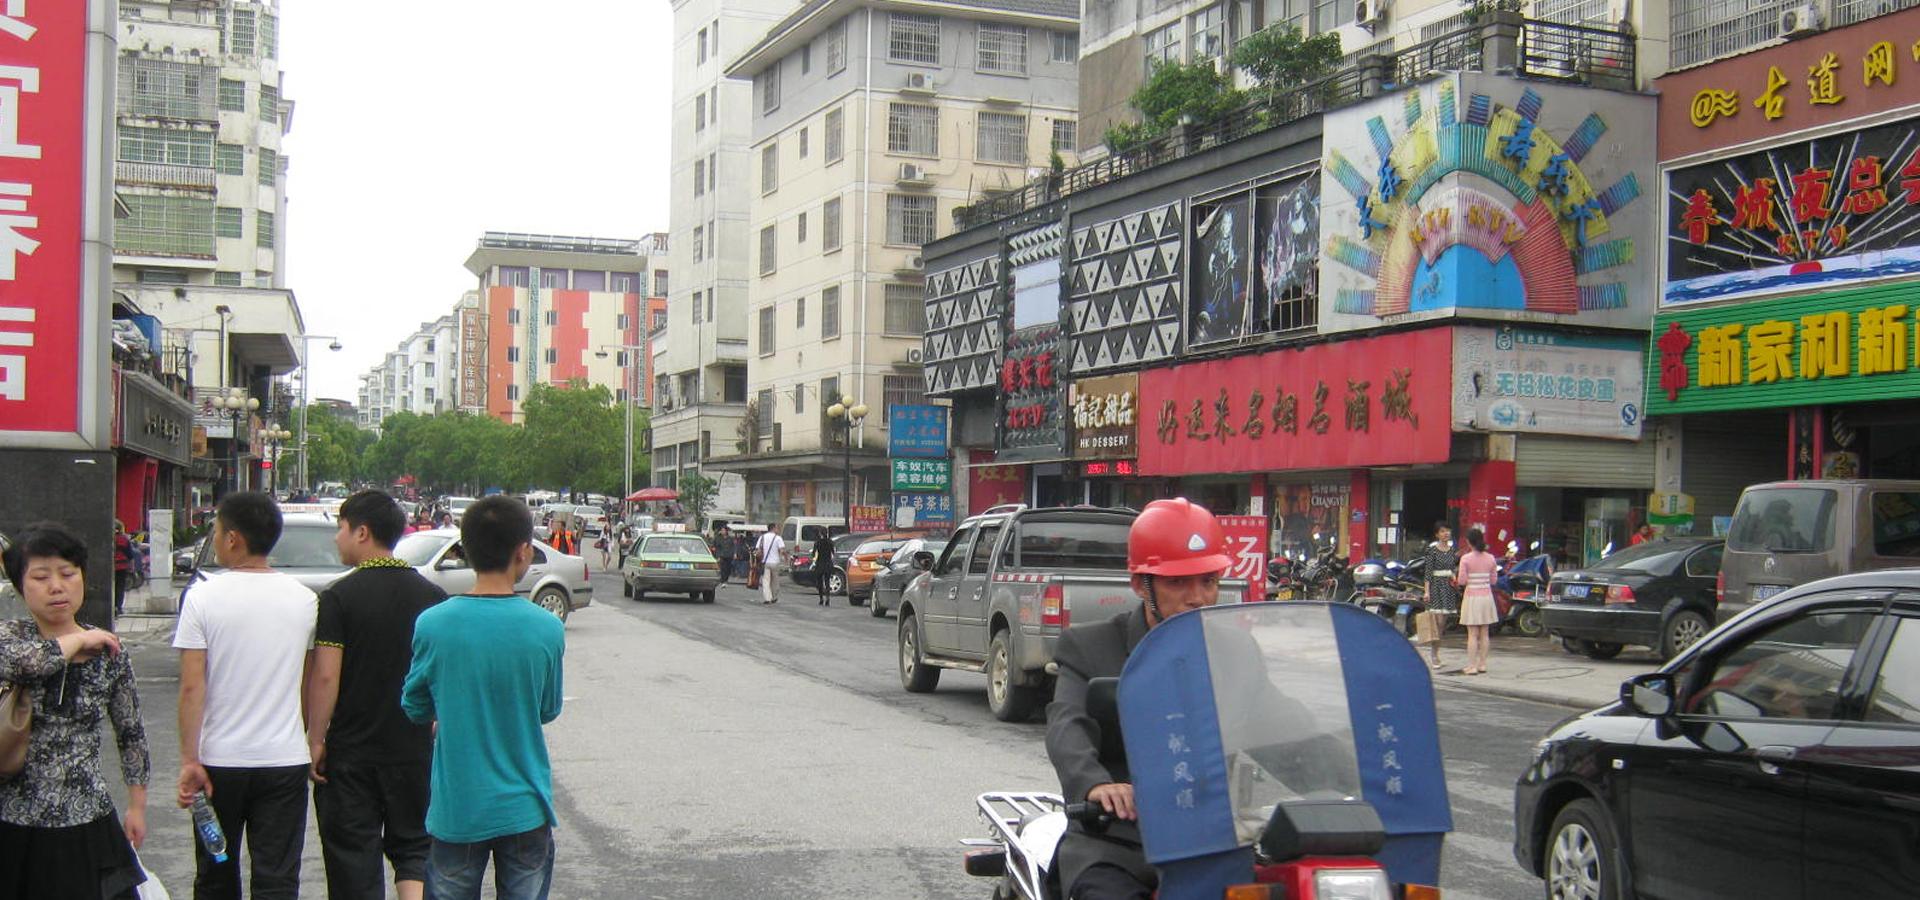 <b>Dingjia, Jiangxi Province, China</b>